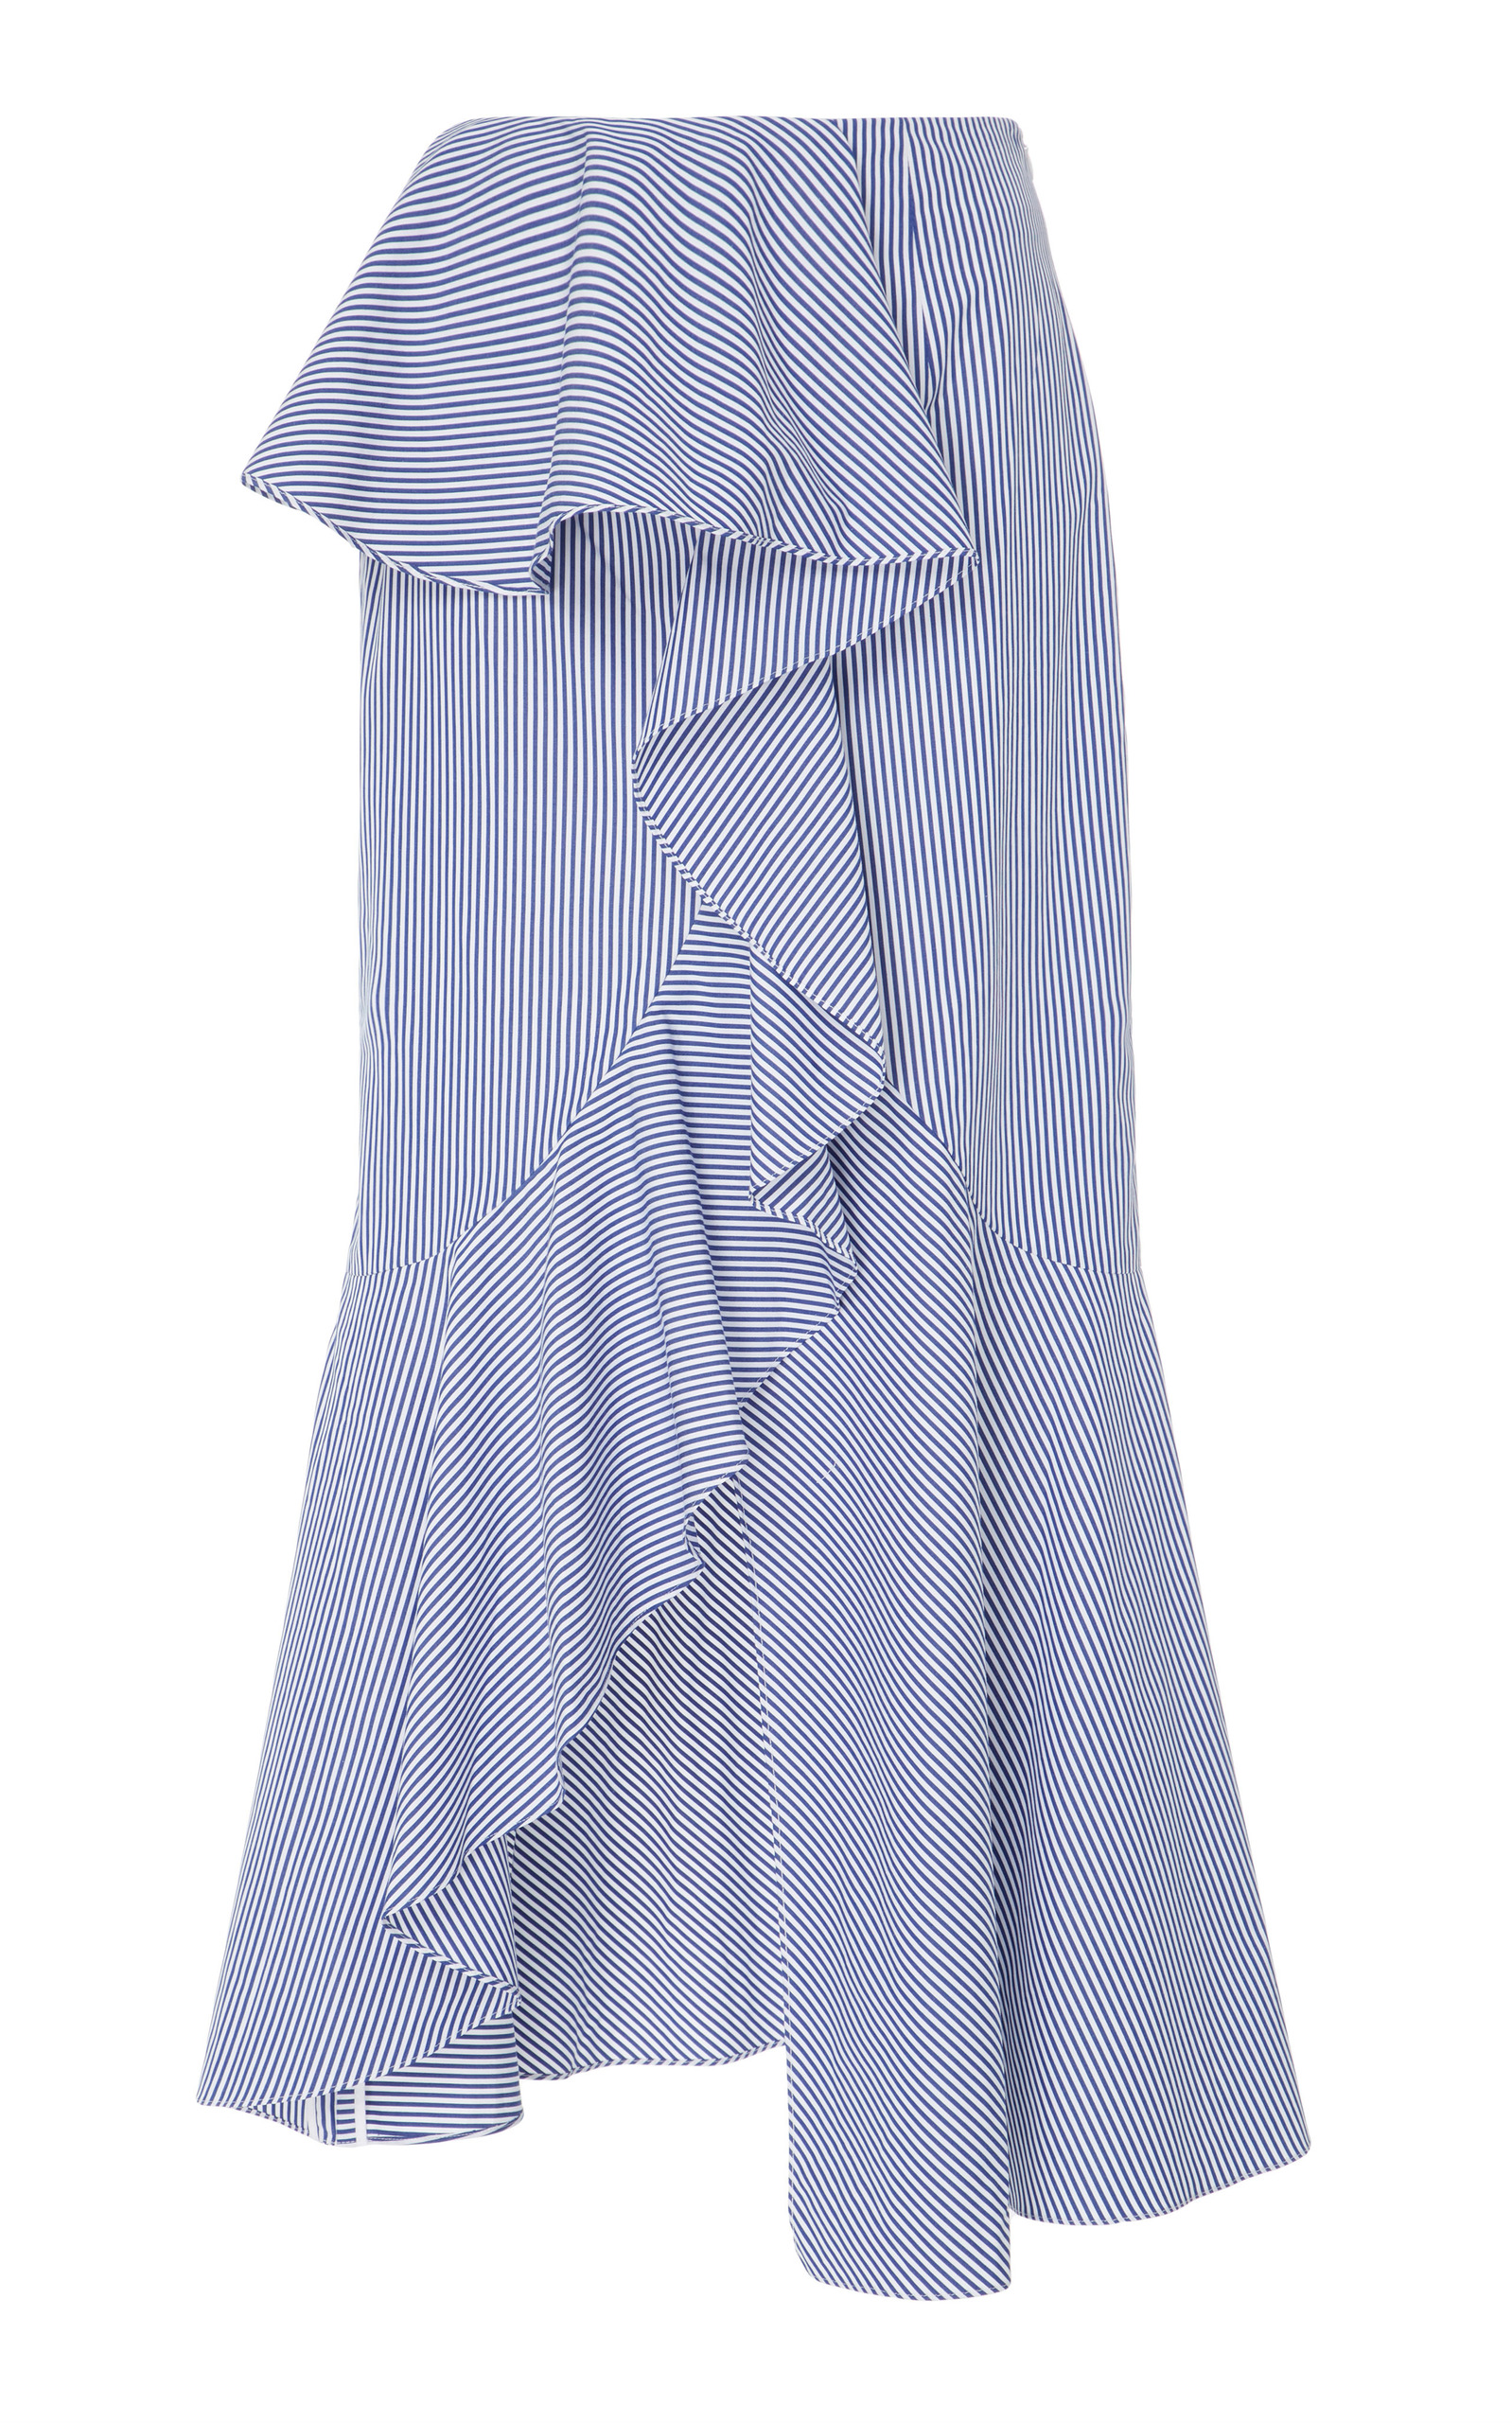 GOEN J Ruffled Striped Cotton-Poplin Midi Skirt in Blue